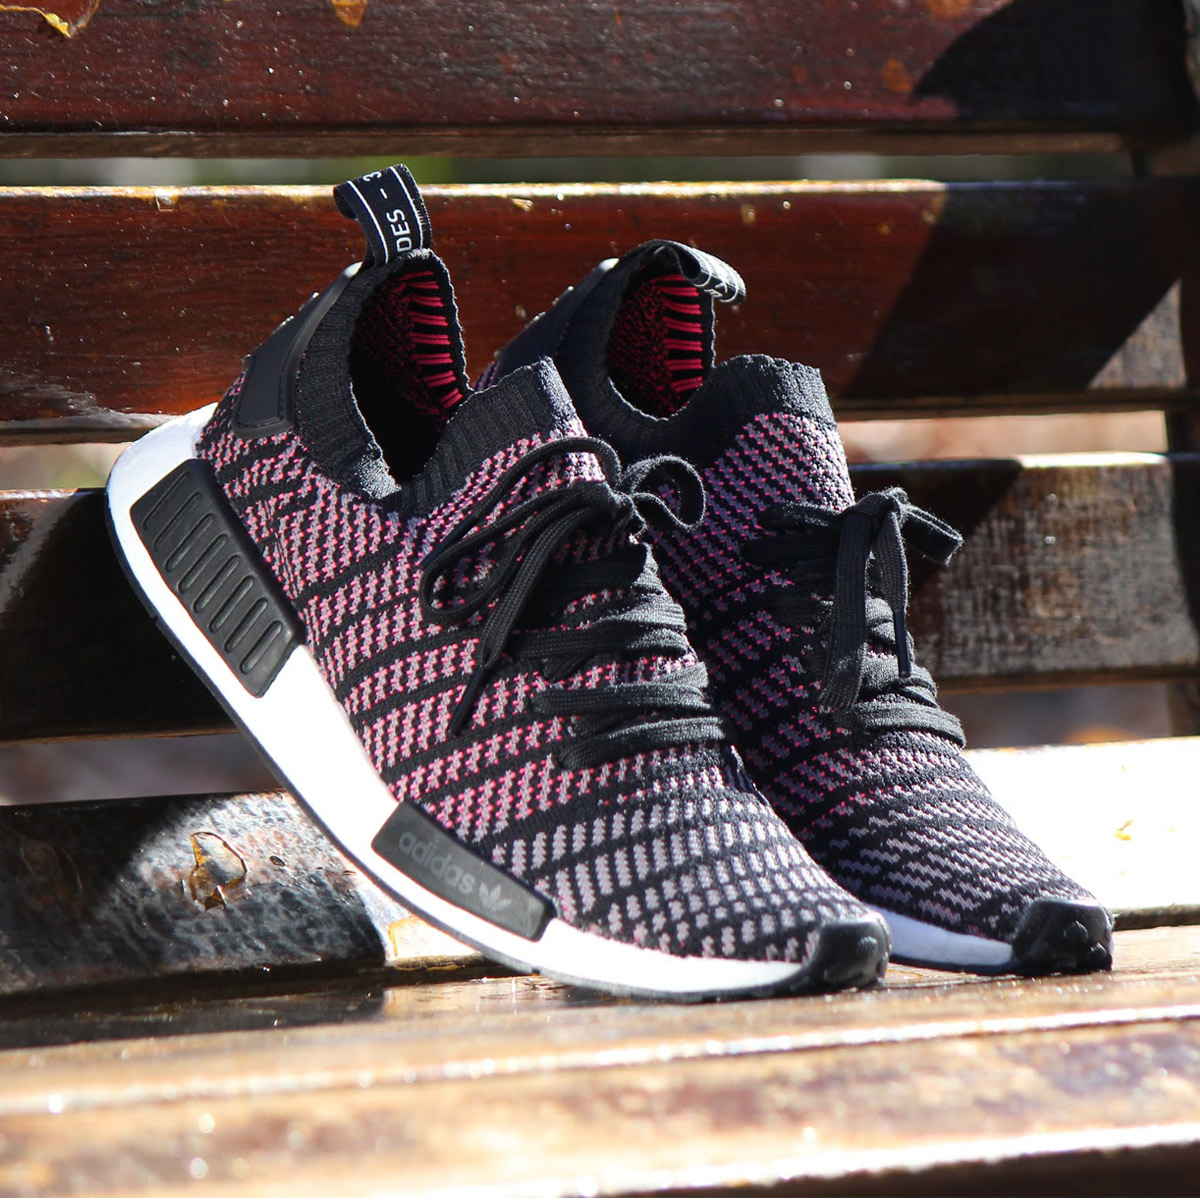 adidas Originals NMD R1 STLT PK(アディダス オリジナルス エヌエムディー R1 STLT PK)Core Black/Grey Four/Solar Pink18SS-S